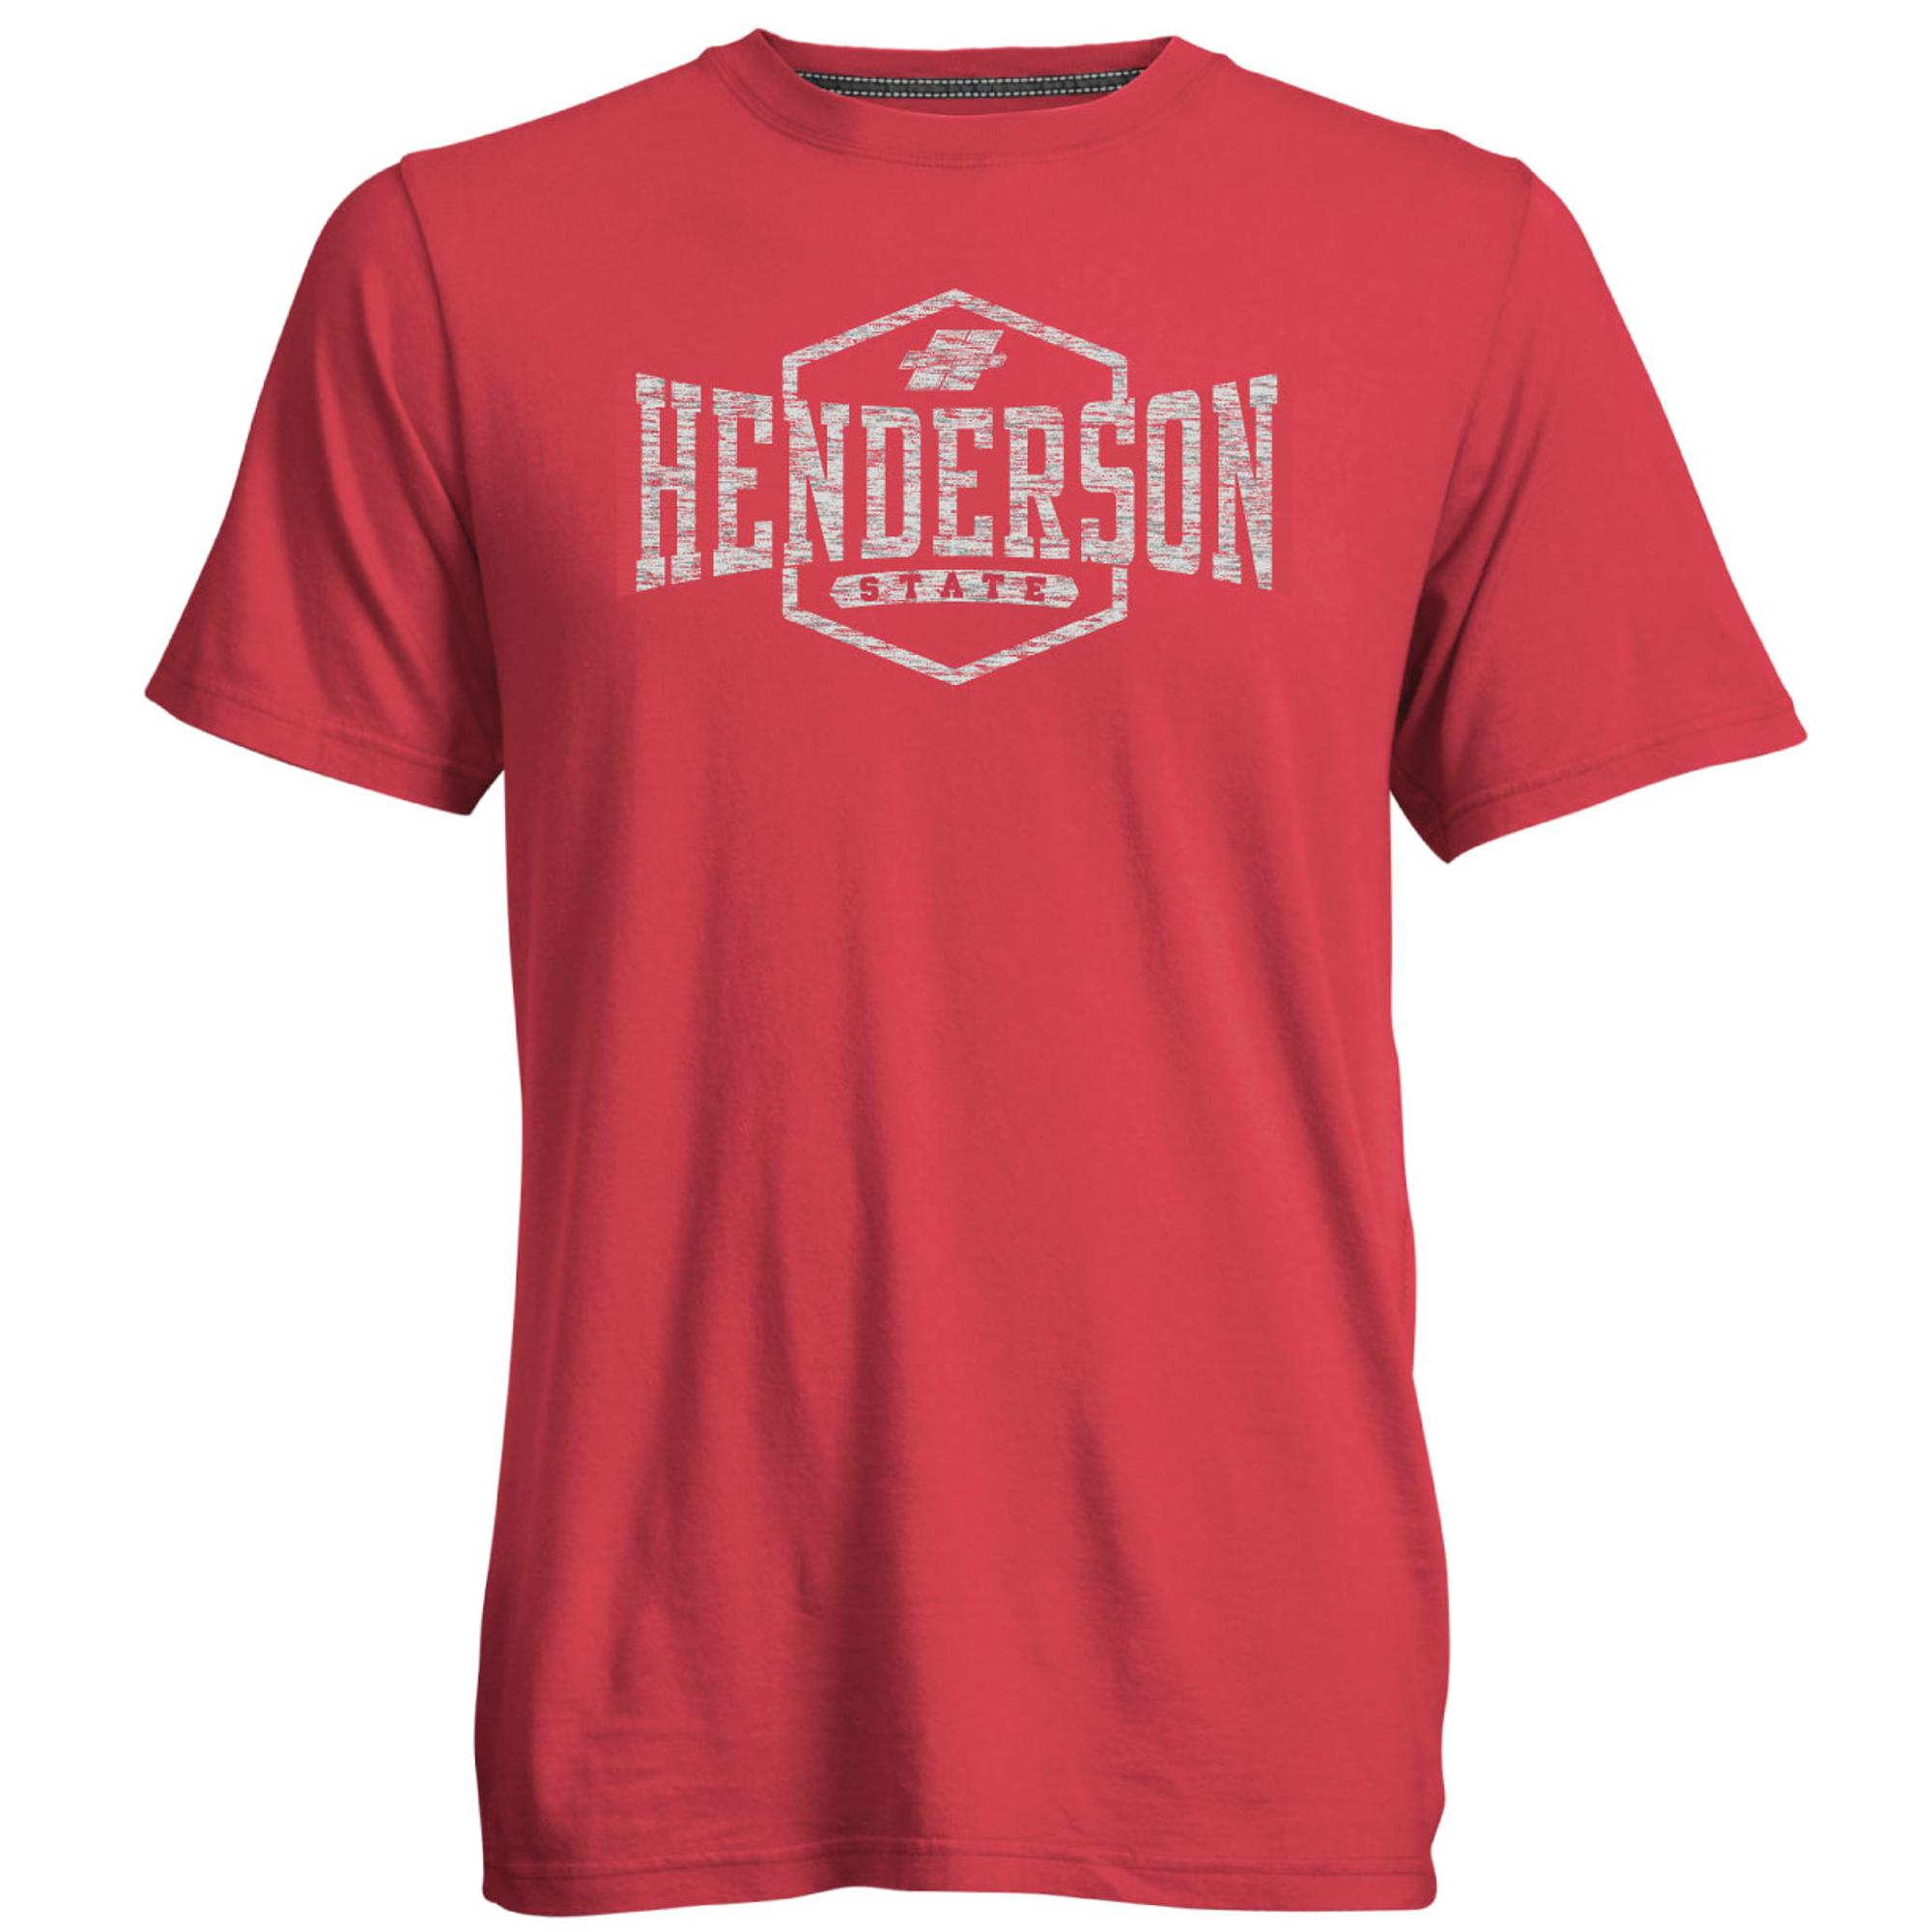 image of: Henderson State Reddies Go To Tee